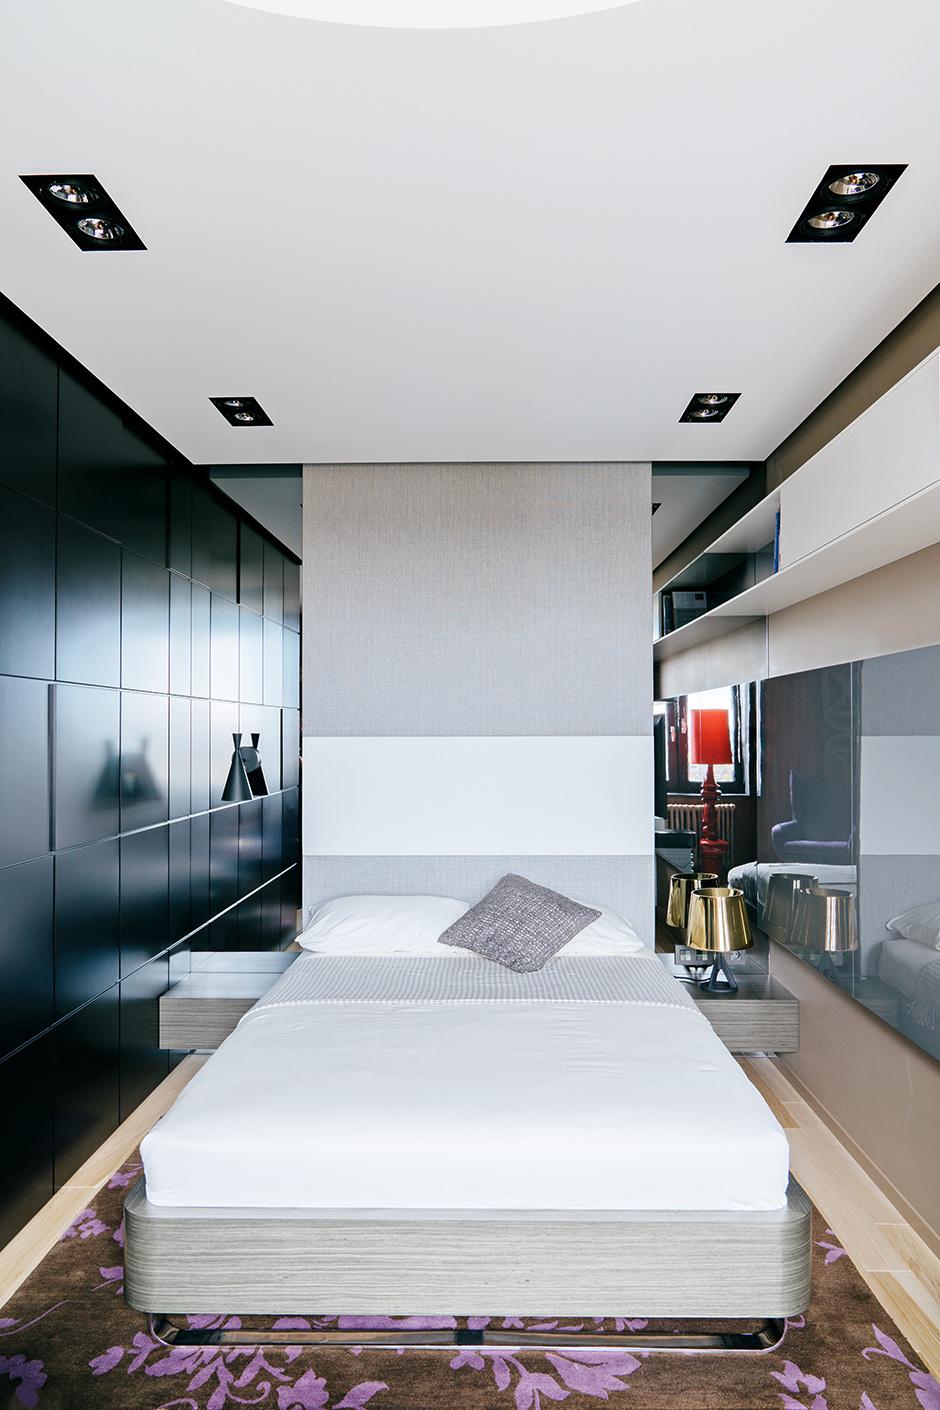 дизайн маленькой квартиры дизайн маленькой квартиры Дизайн маленькой квартиры  1 6b41f87eb3ff92660076c47f5f3b55ac  0xc0a839a4 13242634901485937660